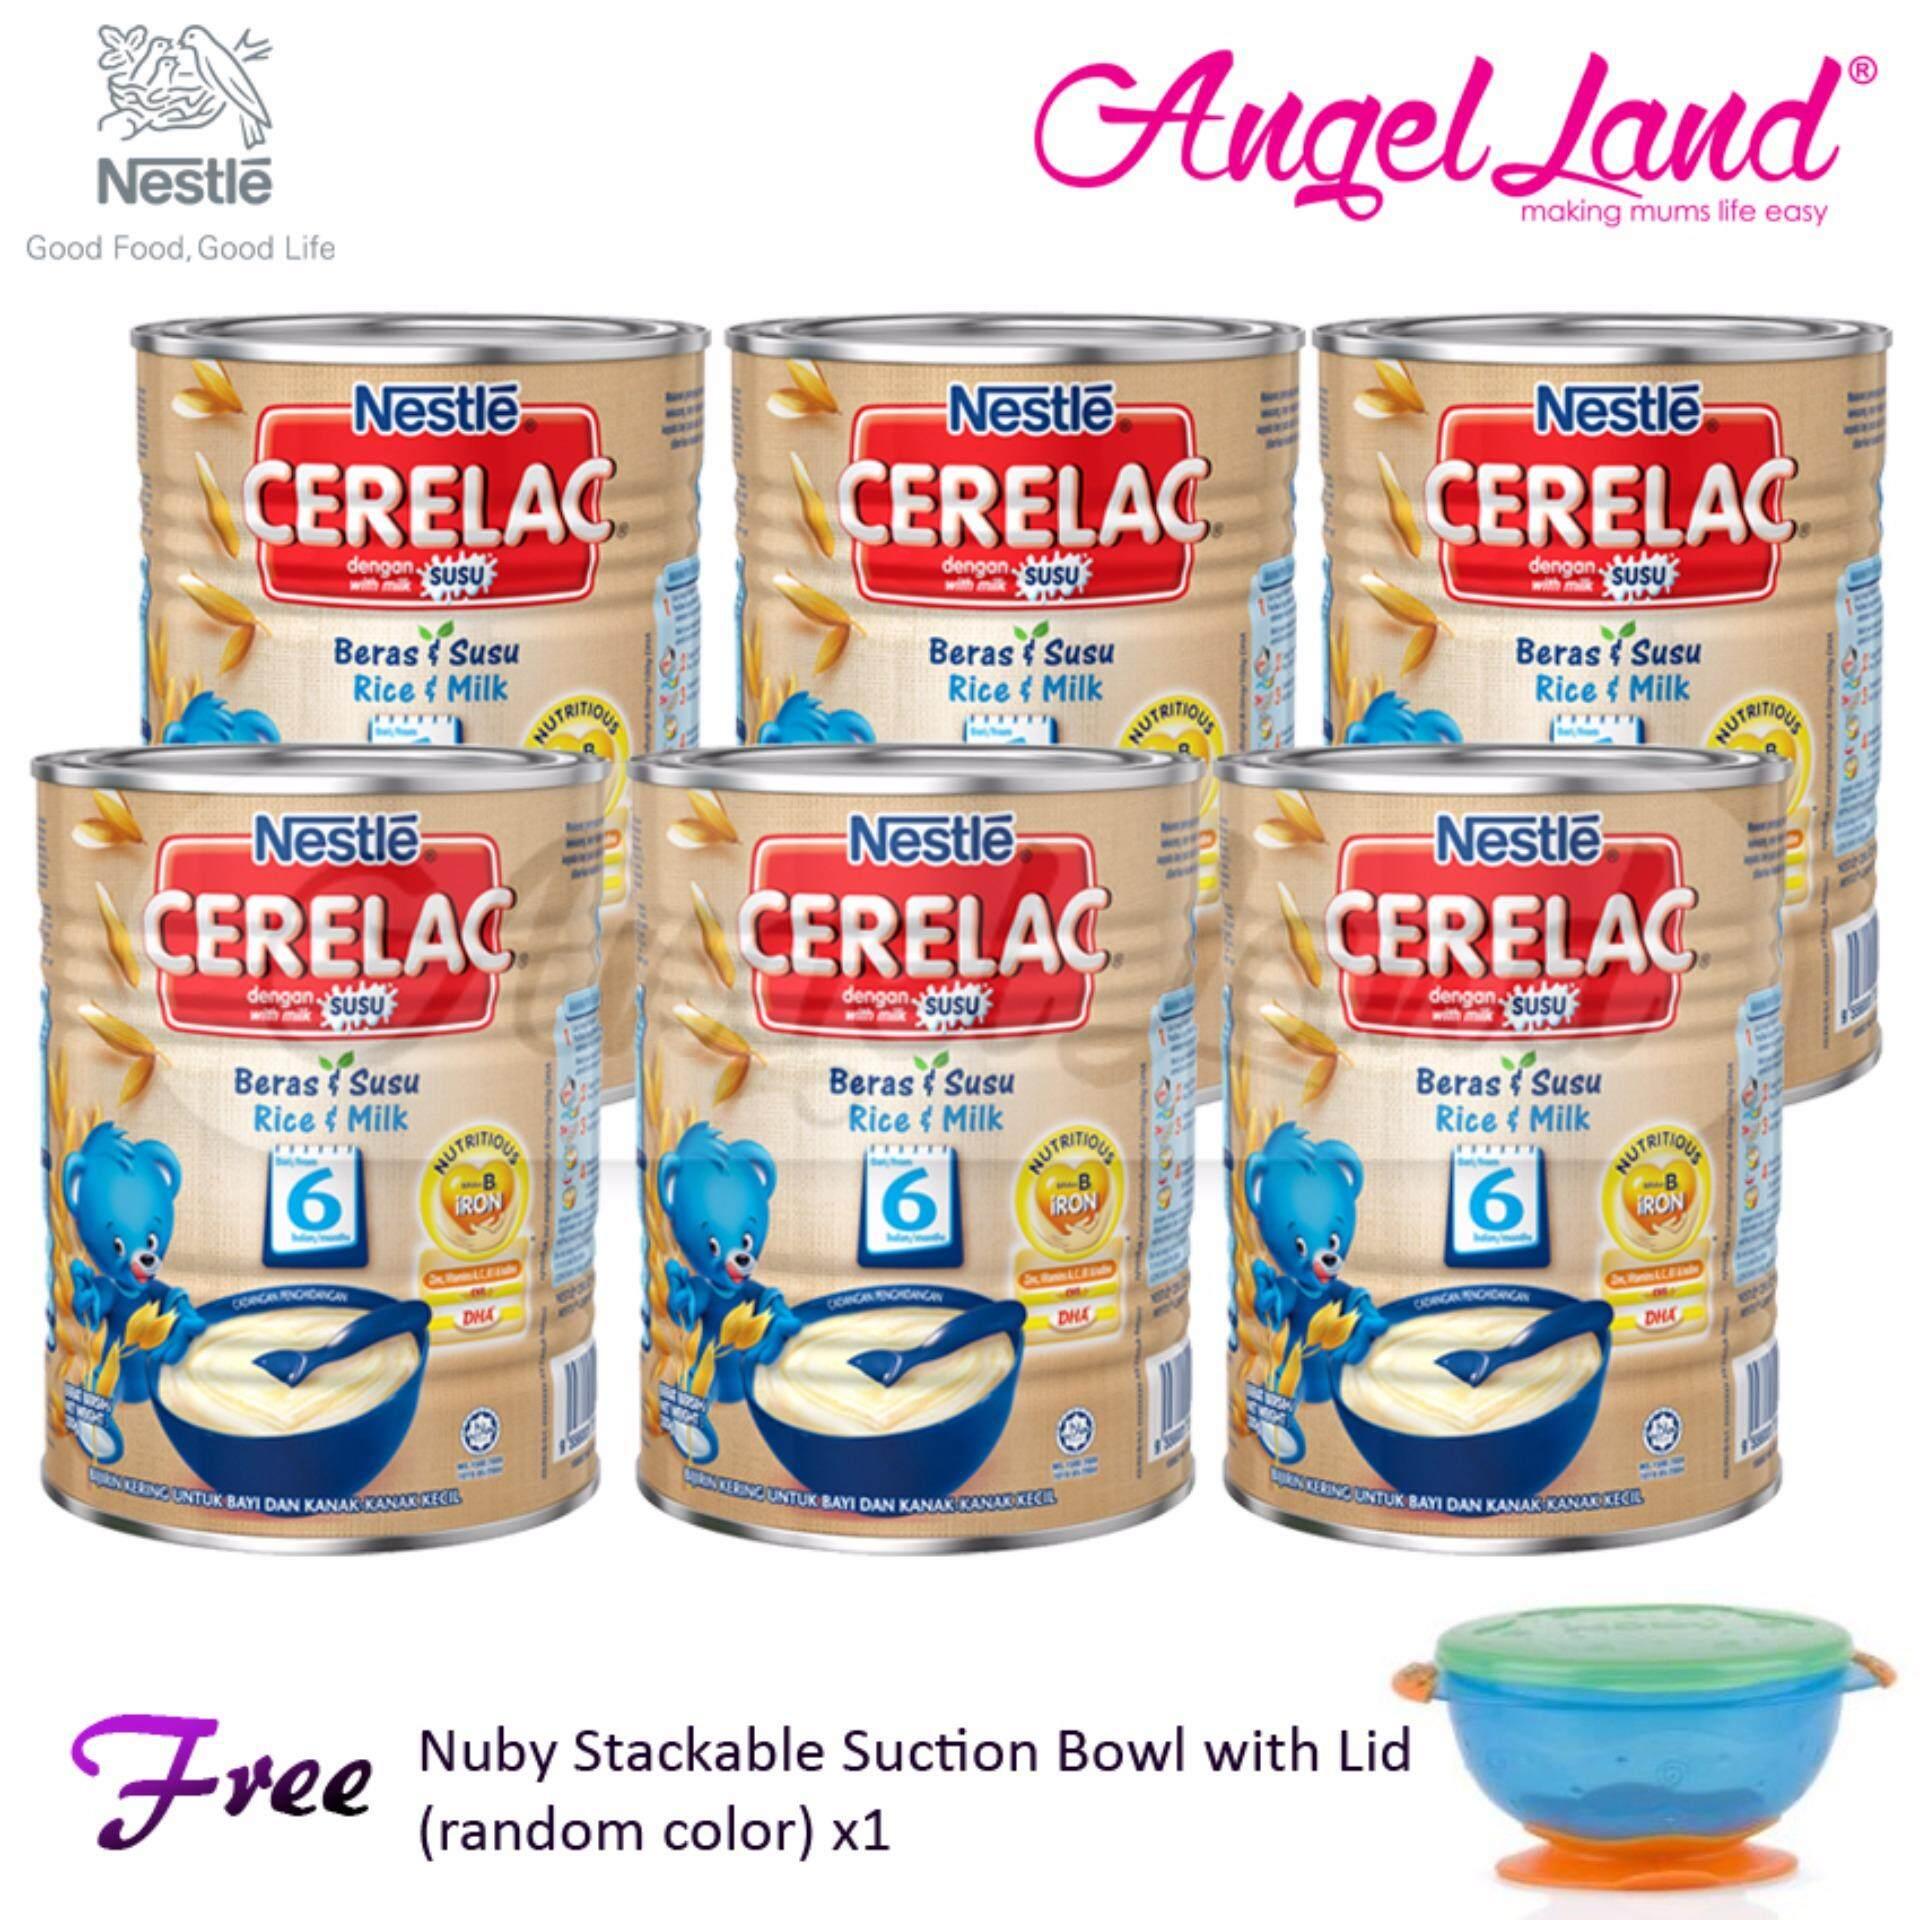 [Buy 6 Cerelac Free Bowl] Cerelac Rice & Milk 6m+ (350g) x6 + FOC 1 Nuby Stackable Suction Bowl (random)